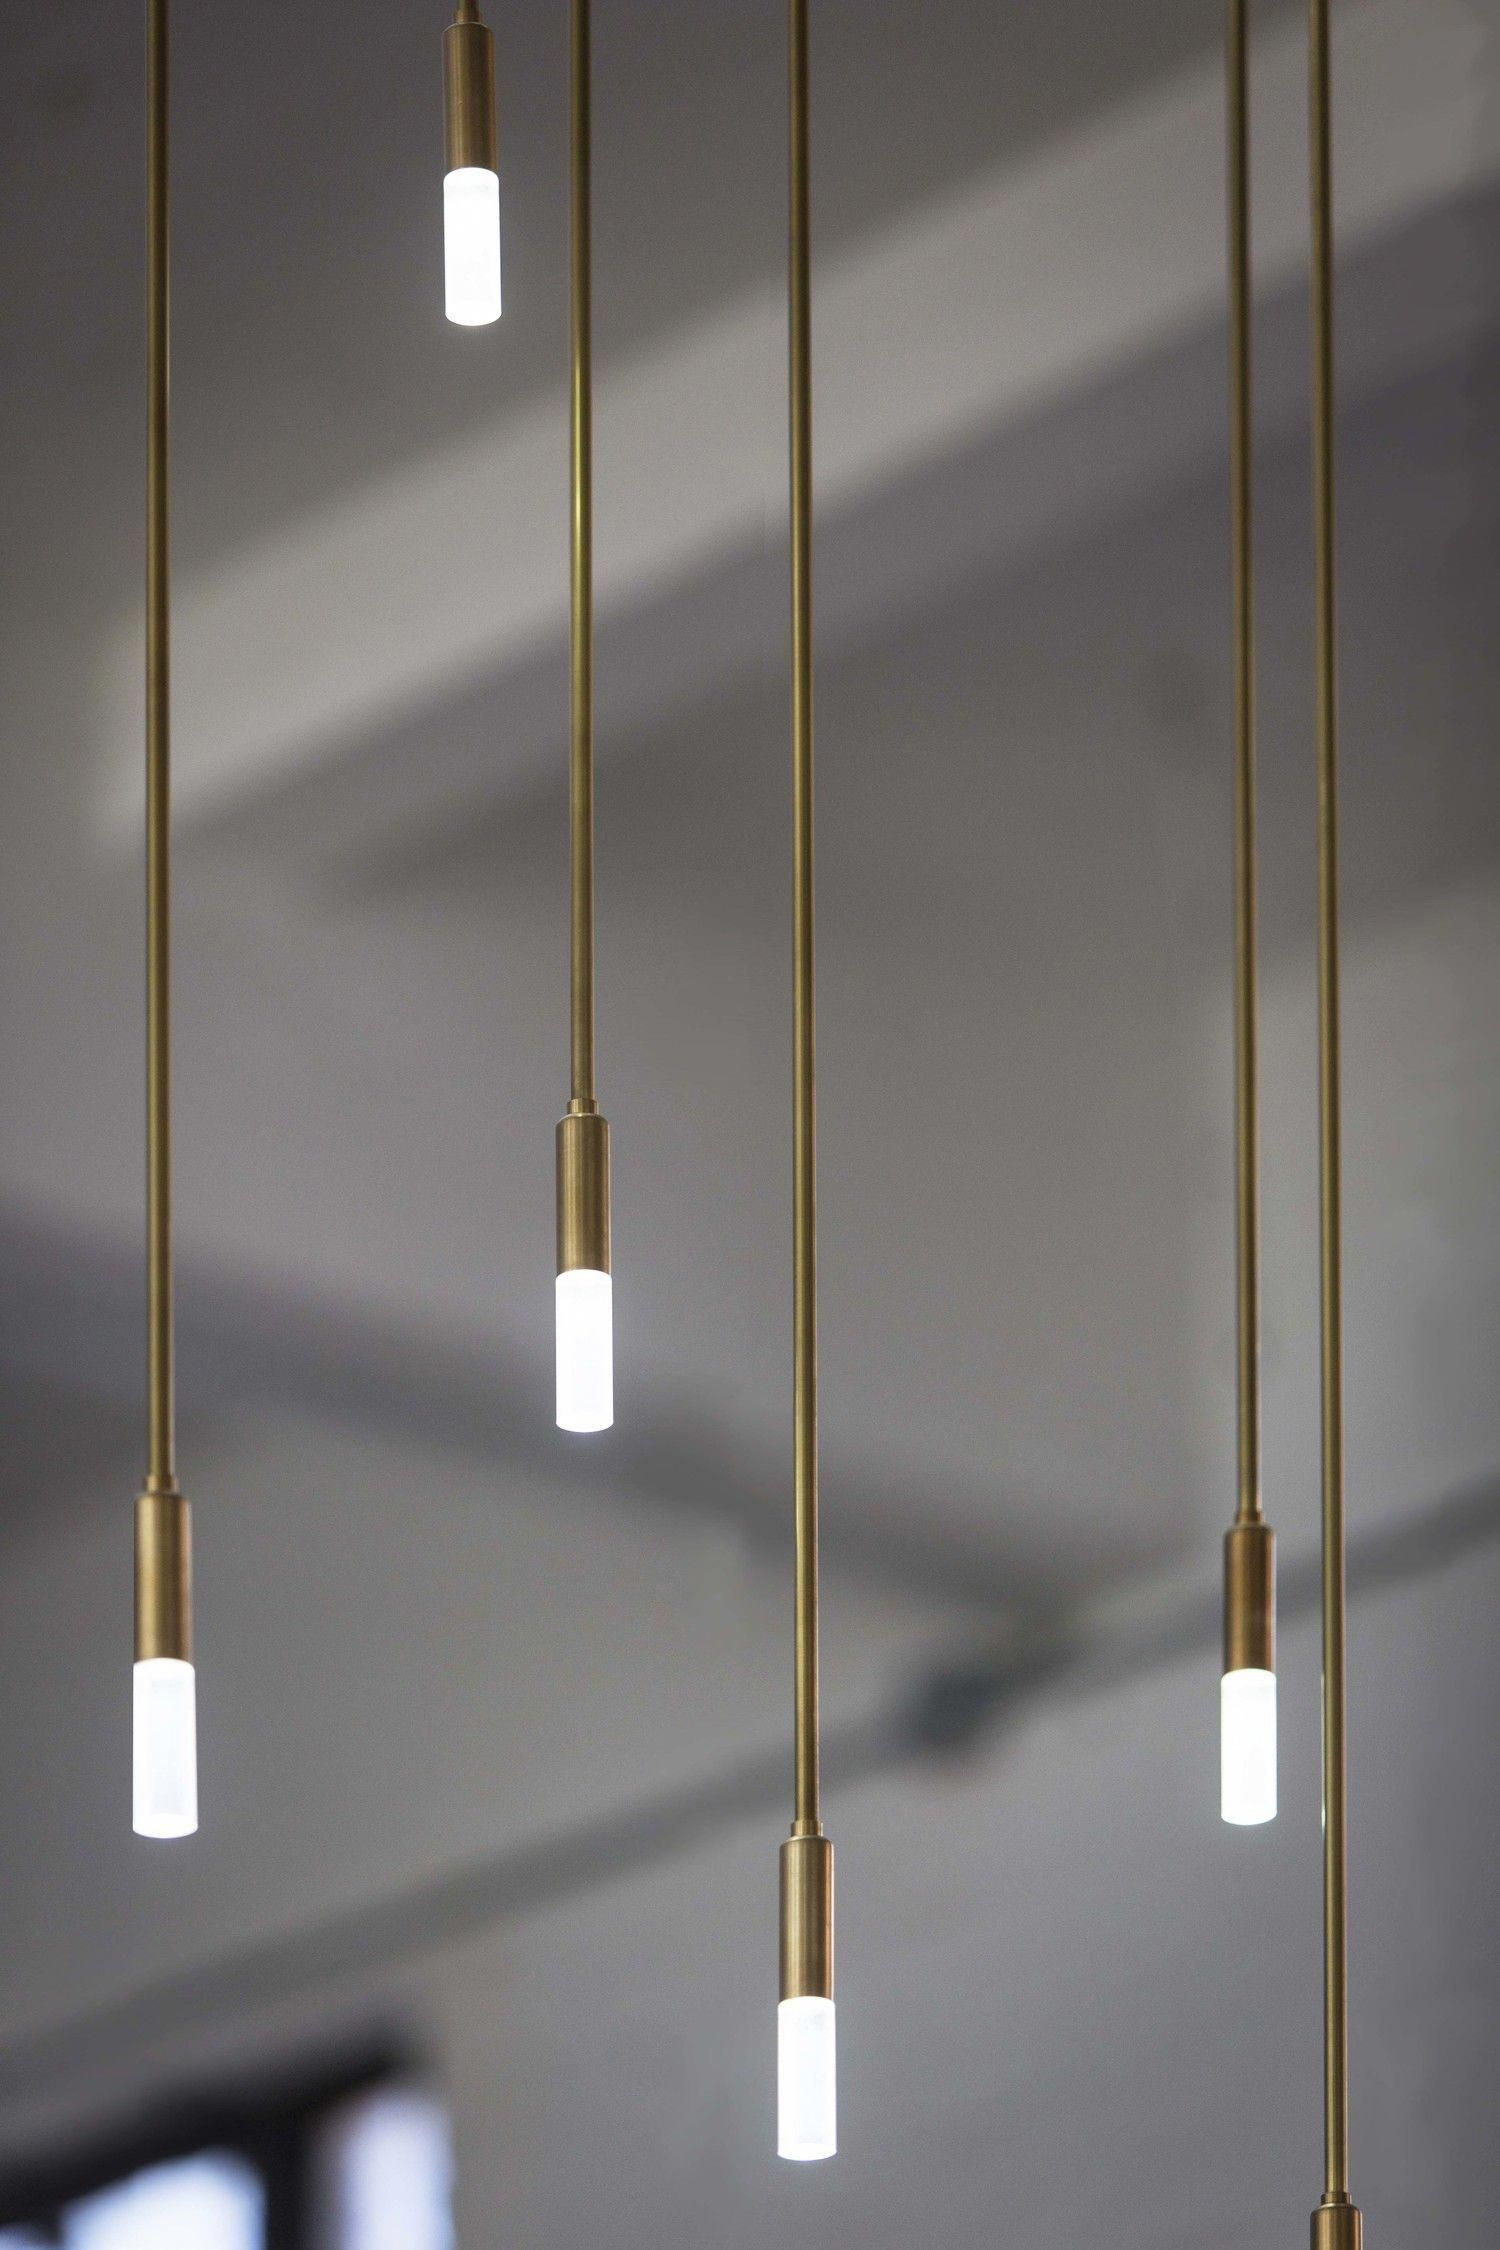 Roof Leaks Lighting Installations Alternative Room Ideas Ceiling Diy Drop Lights Lighting Inspiration Lights